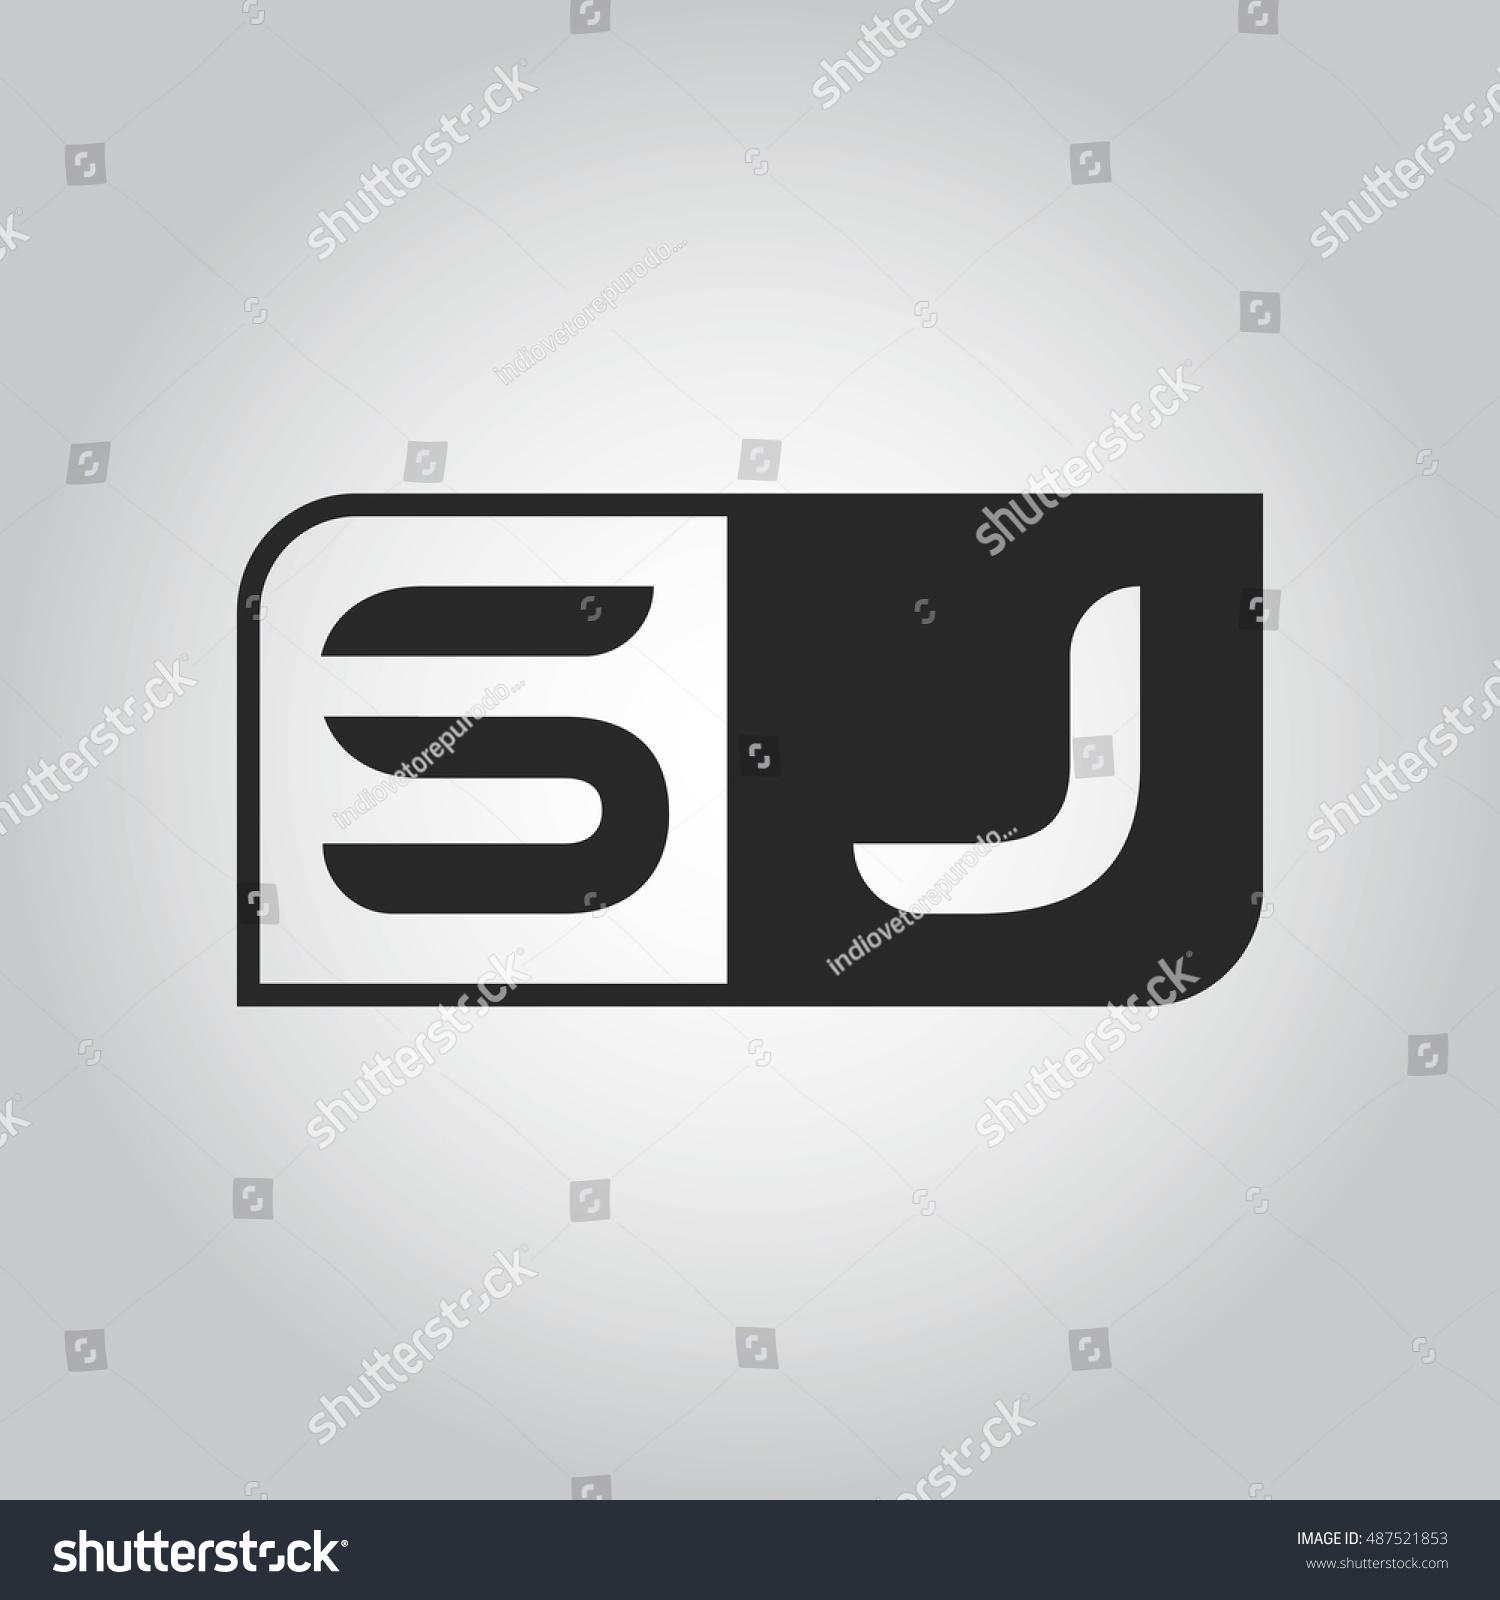 Abbreviations Letter Name Identity Logo Symbol Stock